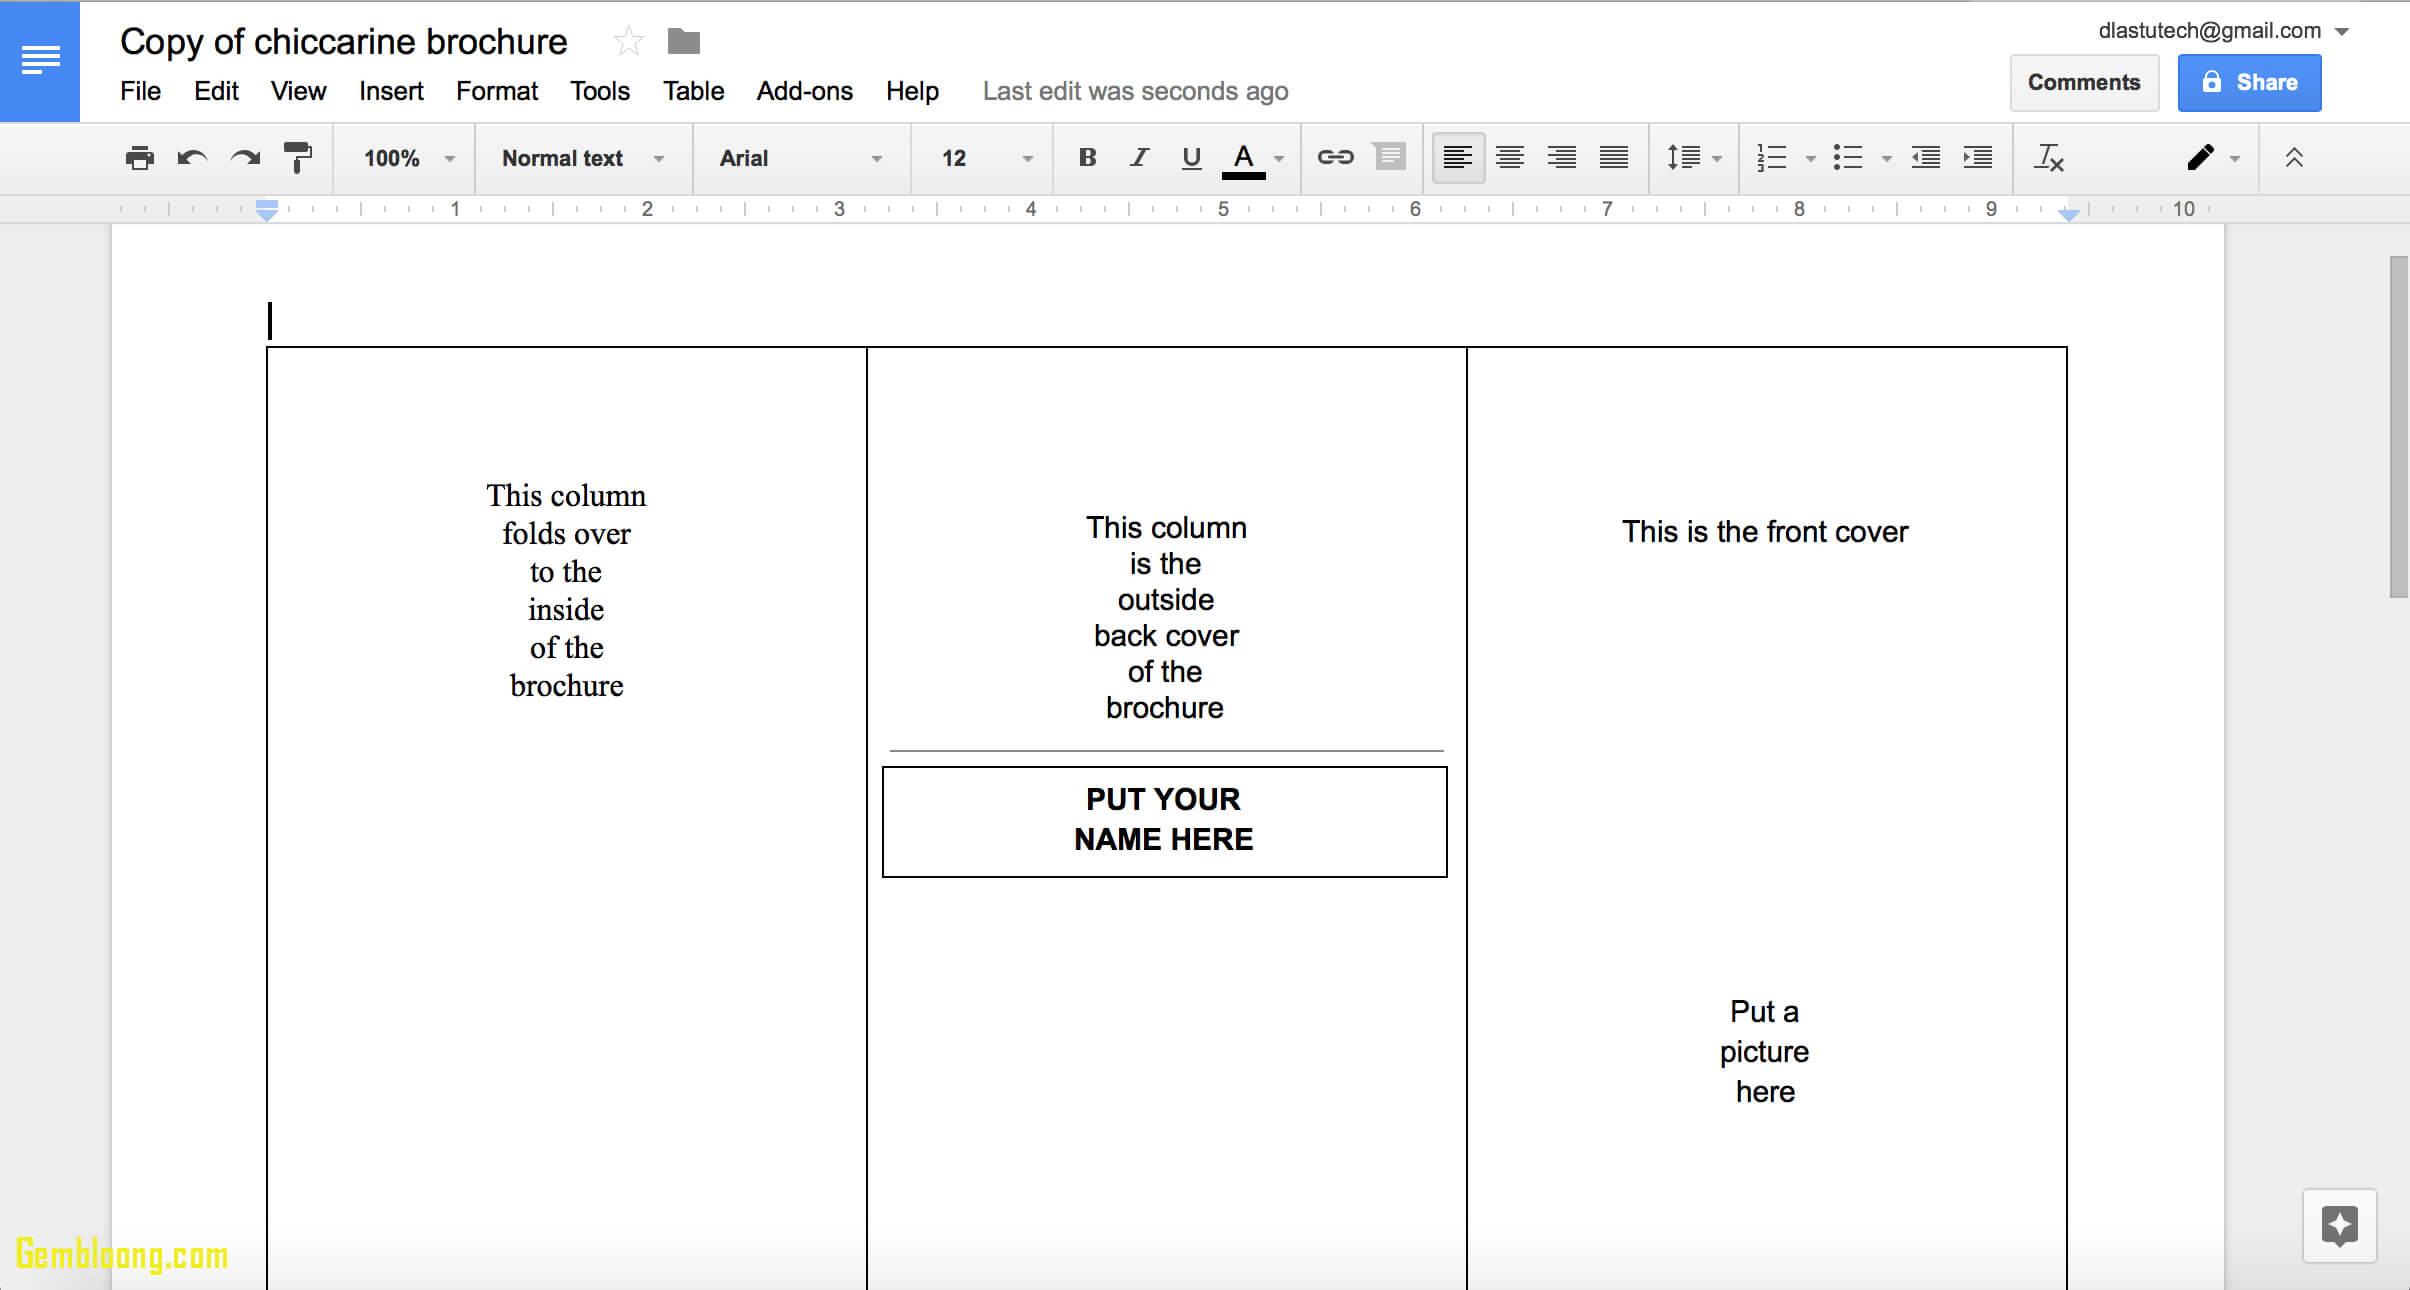 Google Drive Brochure Template - Cokhithuanpham With Regard To Google Drive Templates Brochure